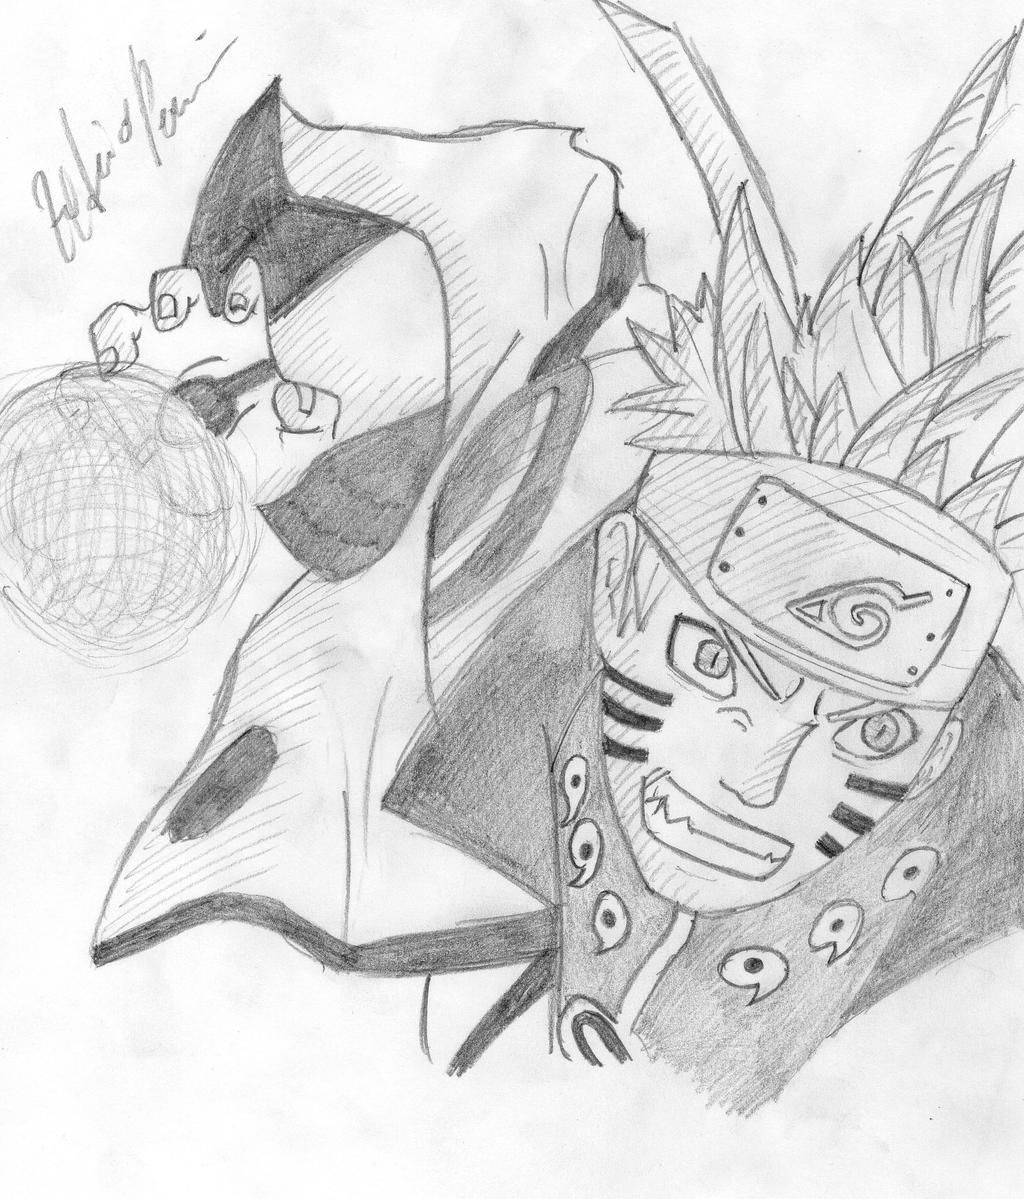 124 Sketsa Gambar Anime Kyubi Sketsa